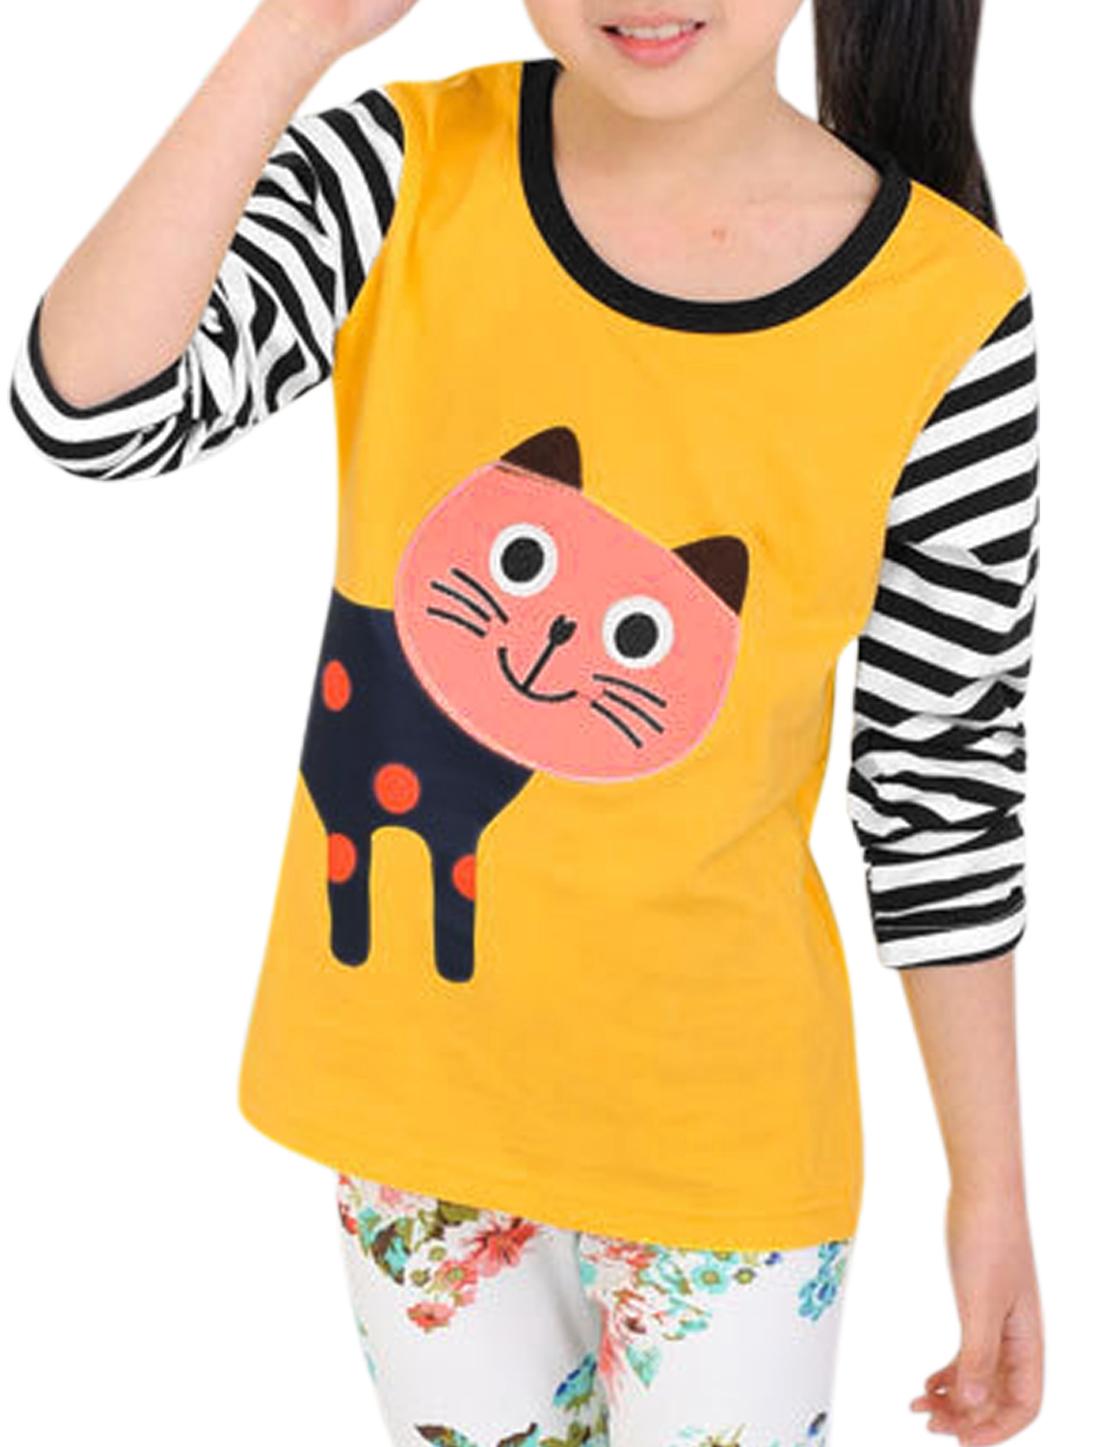 Girls Stripes Cartoon Cat Applique Leisure Top Yellow 10